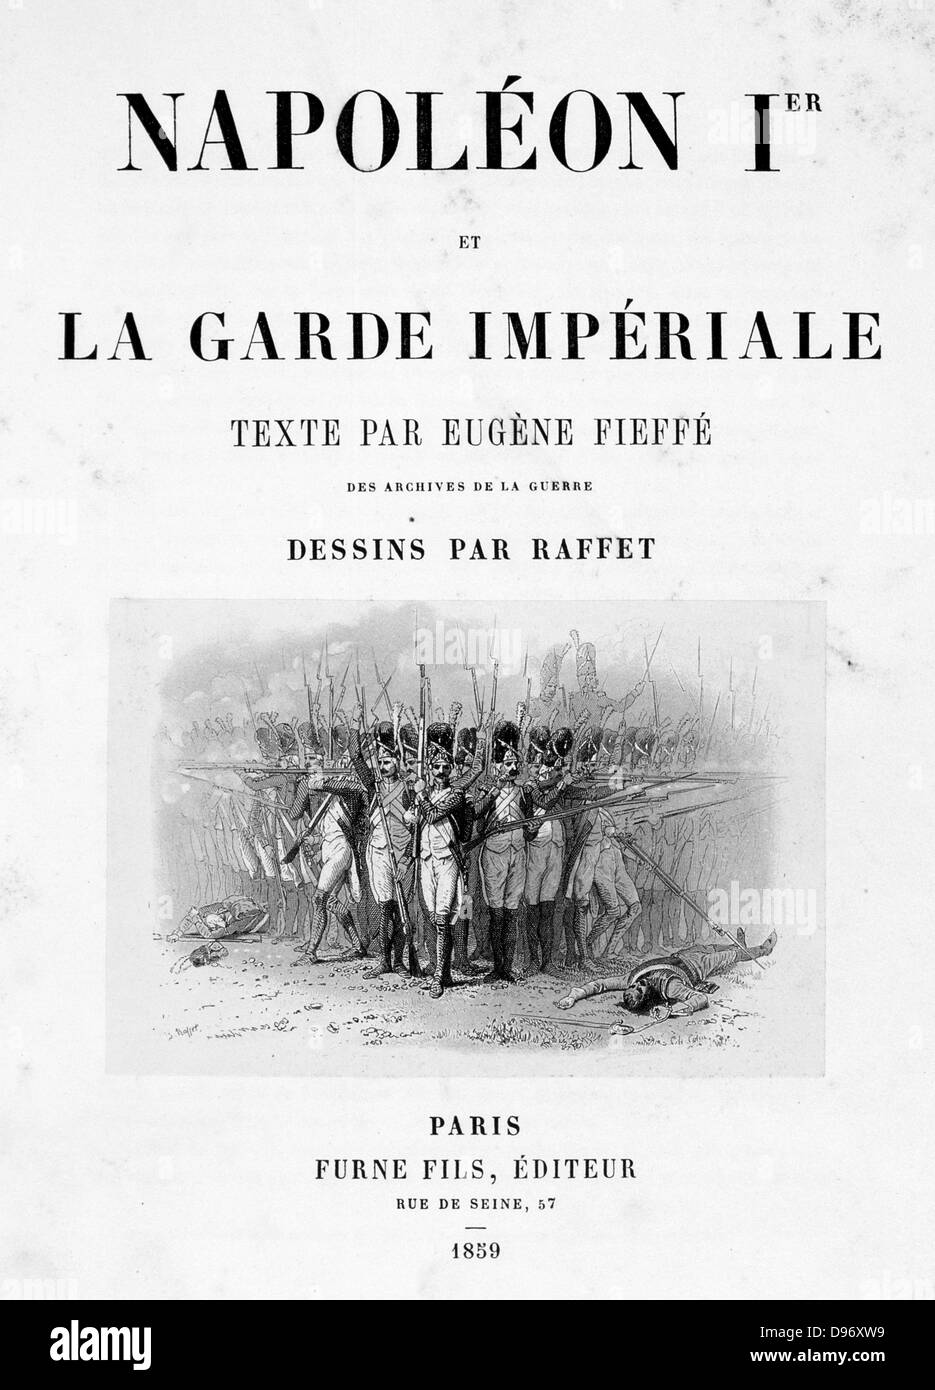 Title page of 'Napoleon 1er et la Garde Imperiale' by Eugene Fieffe, Paris, 1858. - Stock Image